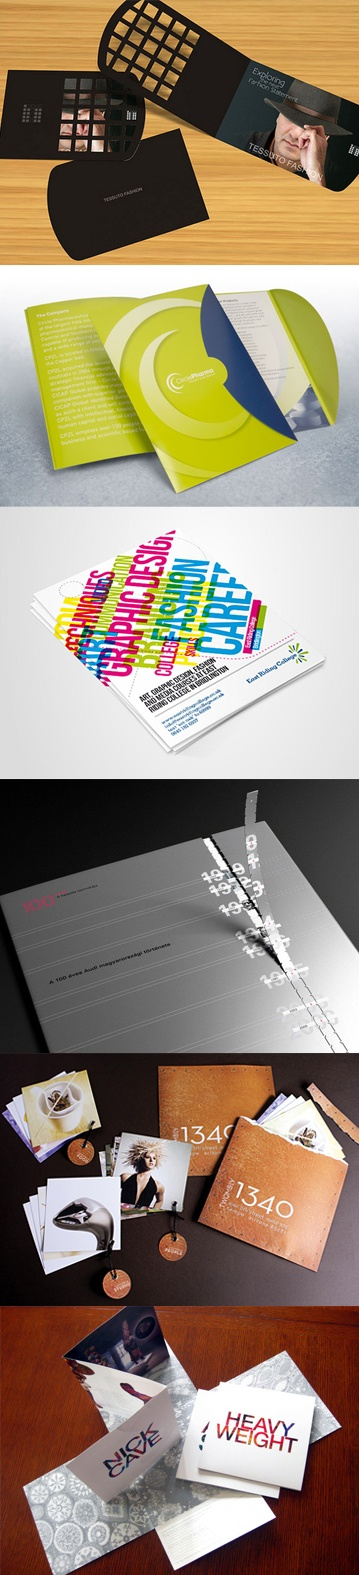 #Creative #Brochure #Design 83oranges.com http://toopixel.ch